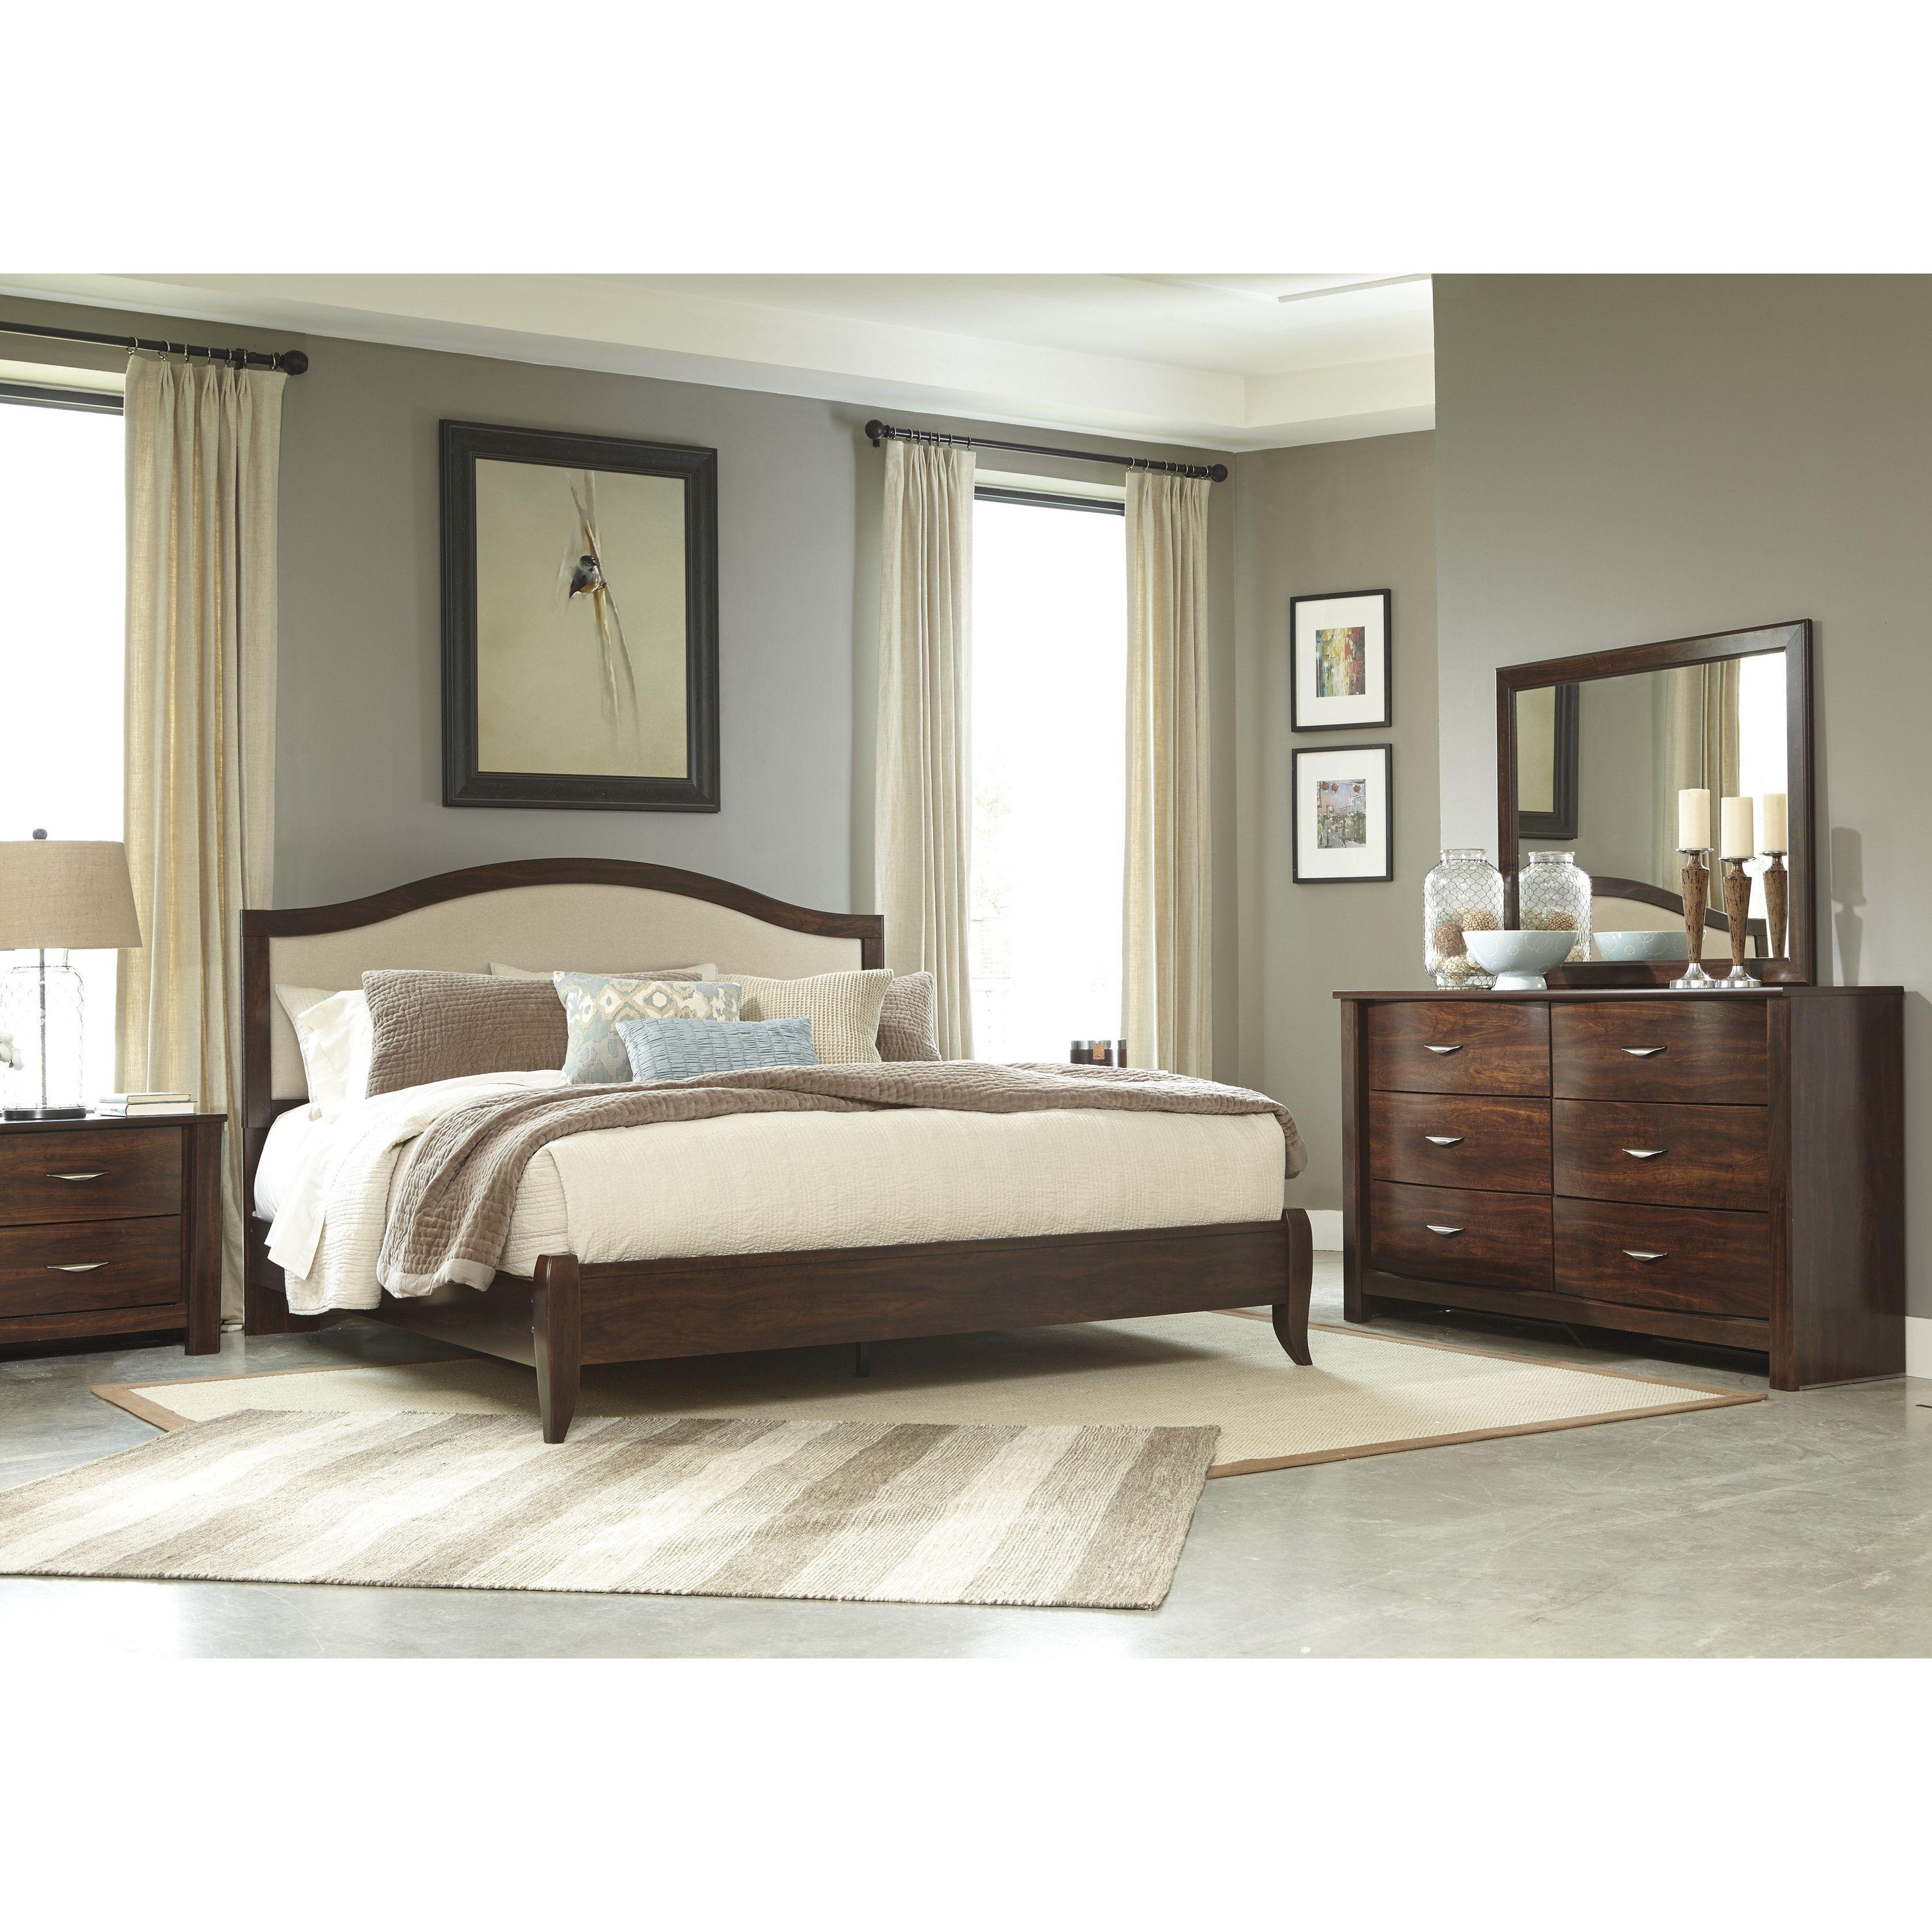 Master bedroom king size bed designs  Signature Design by Ashley Corraya Brown Kingsize Bed Kingsize